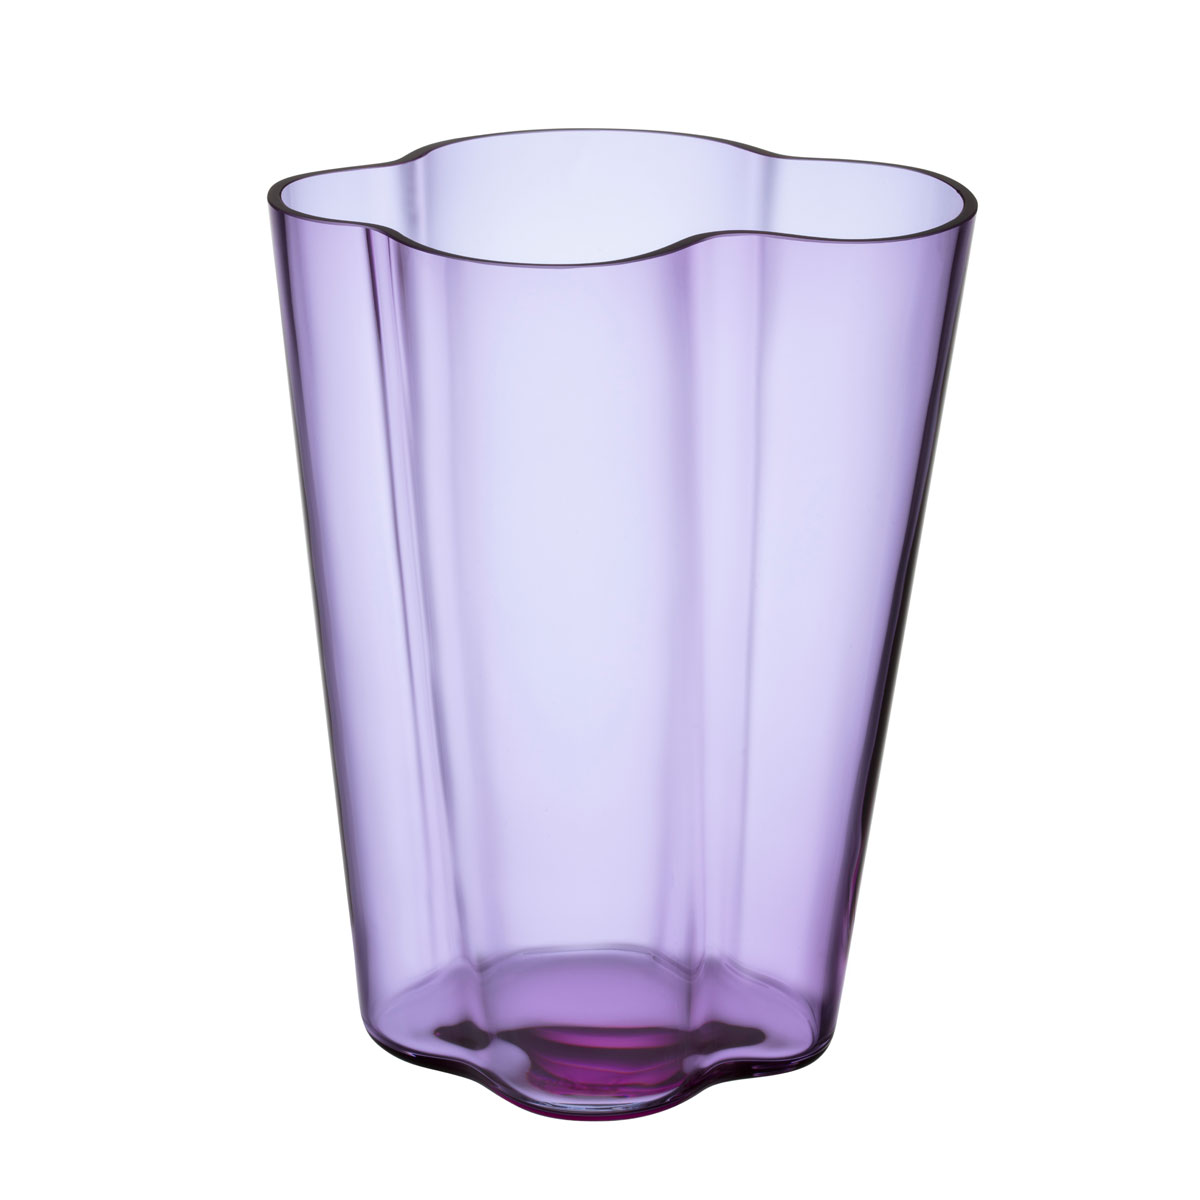 "Iittala Aalto Vase 10.5"" Amethyst"